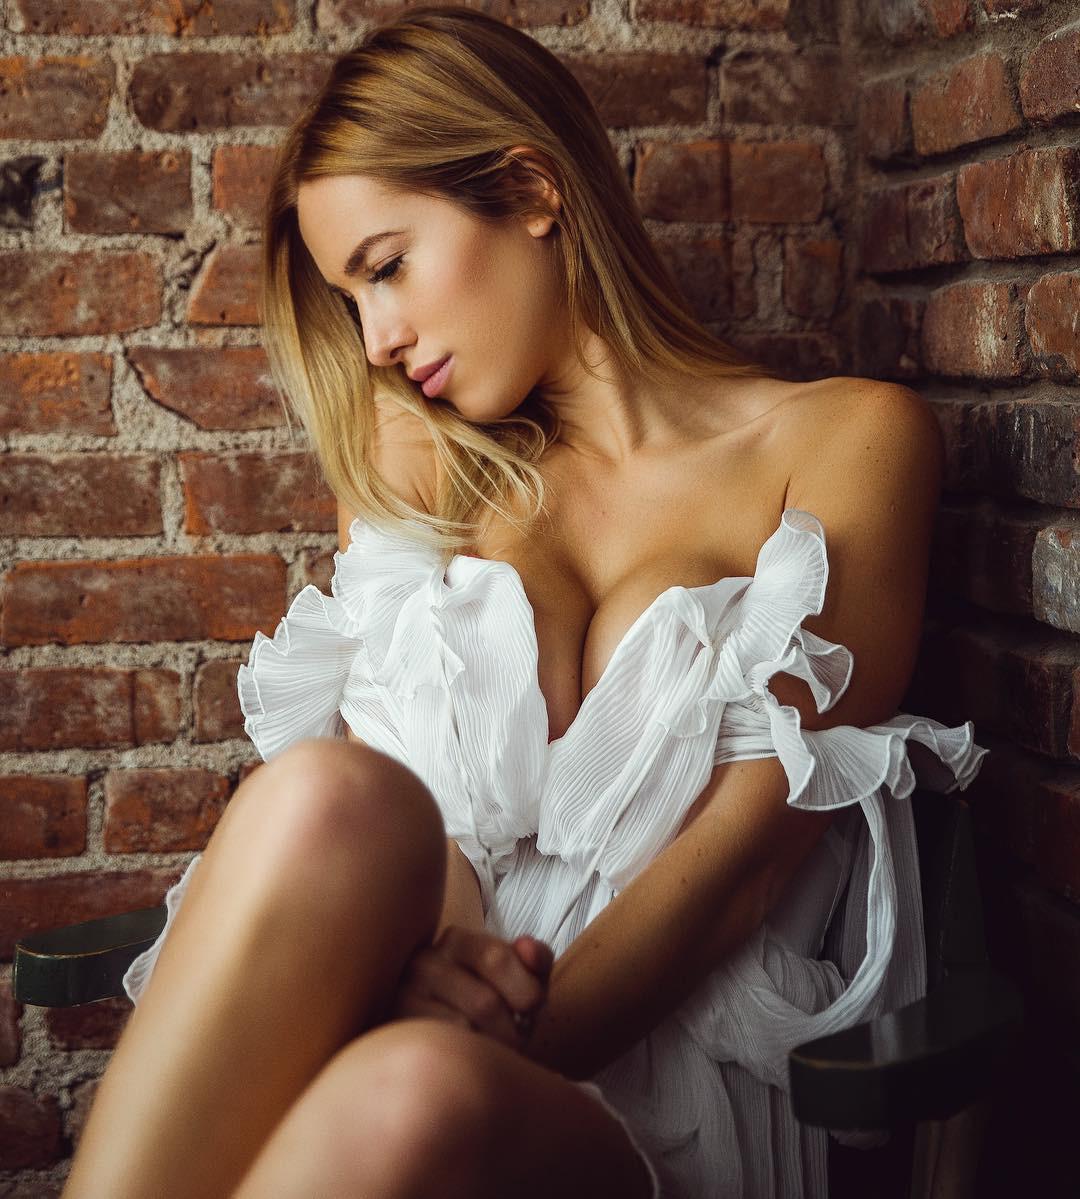 Maria Doroshina girls photoshoot, photography for girl, legs picture